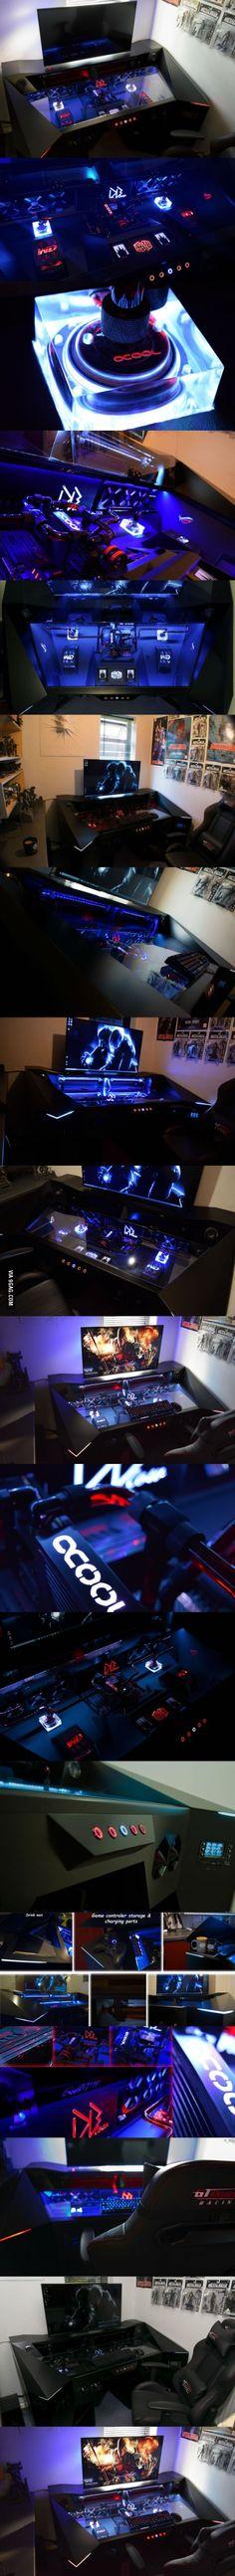 A 4K gaming PC custom-built in desk